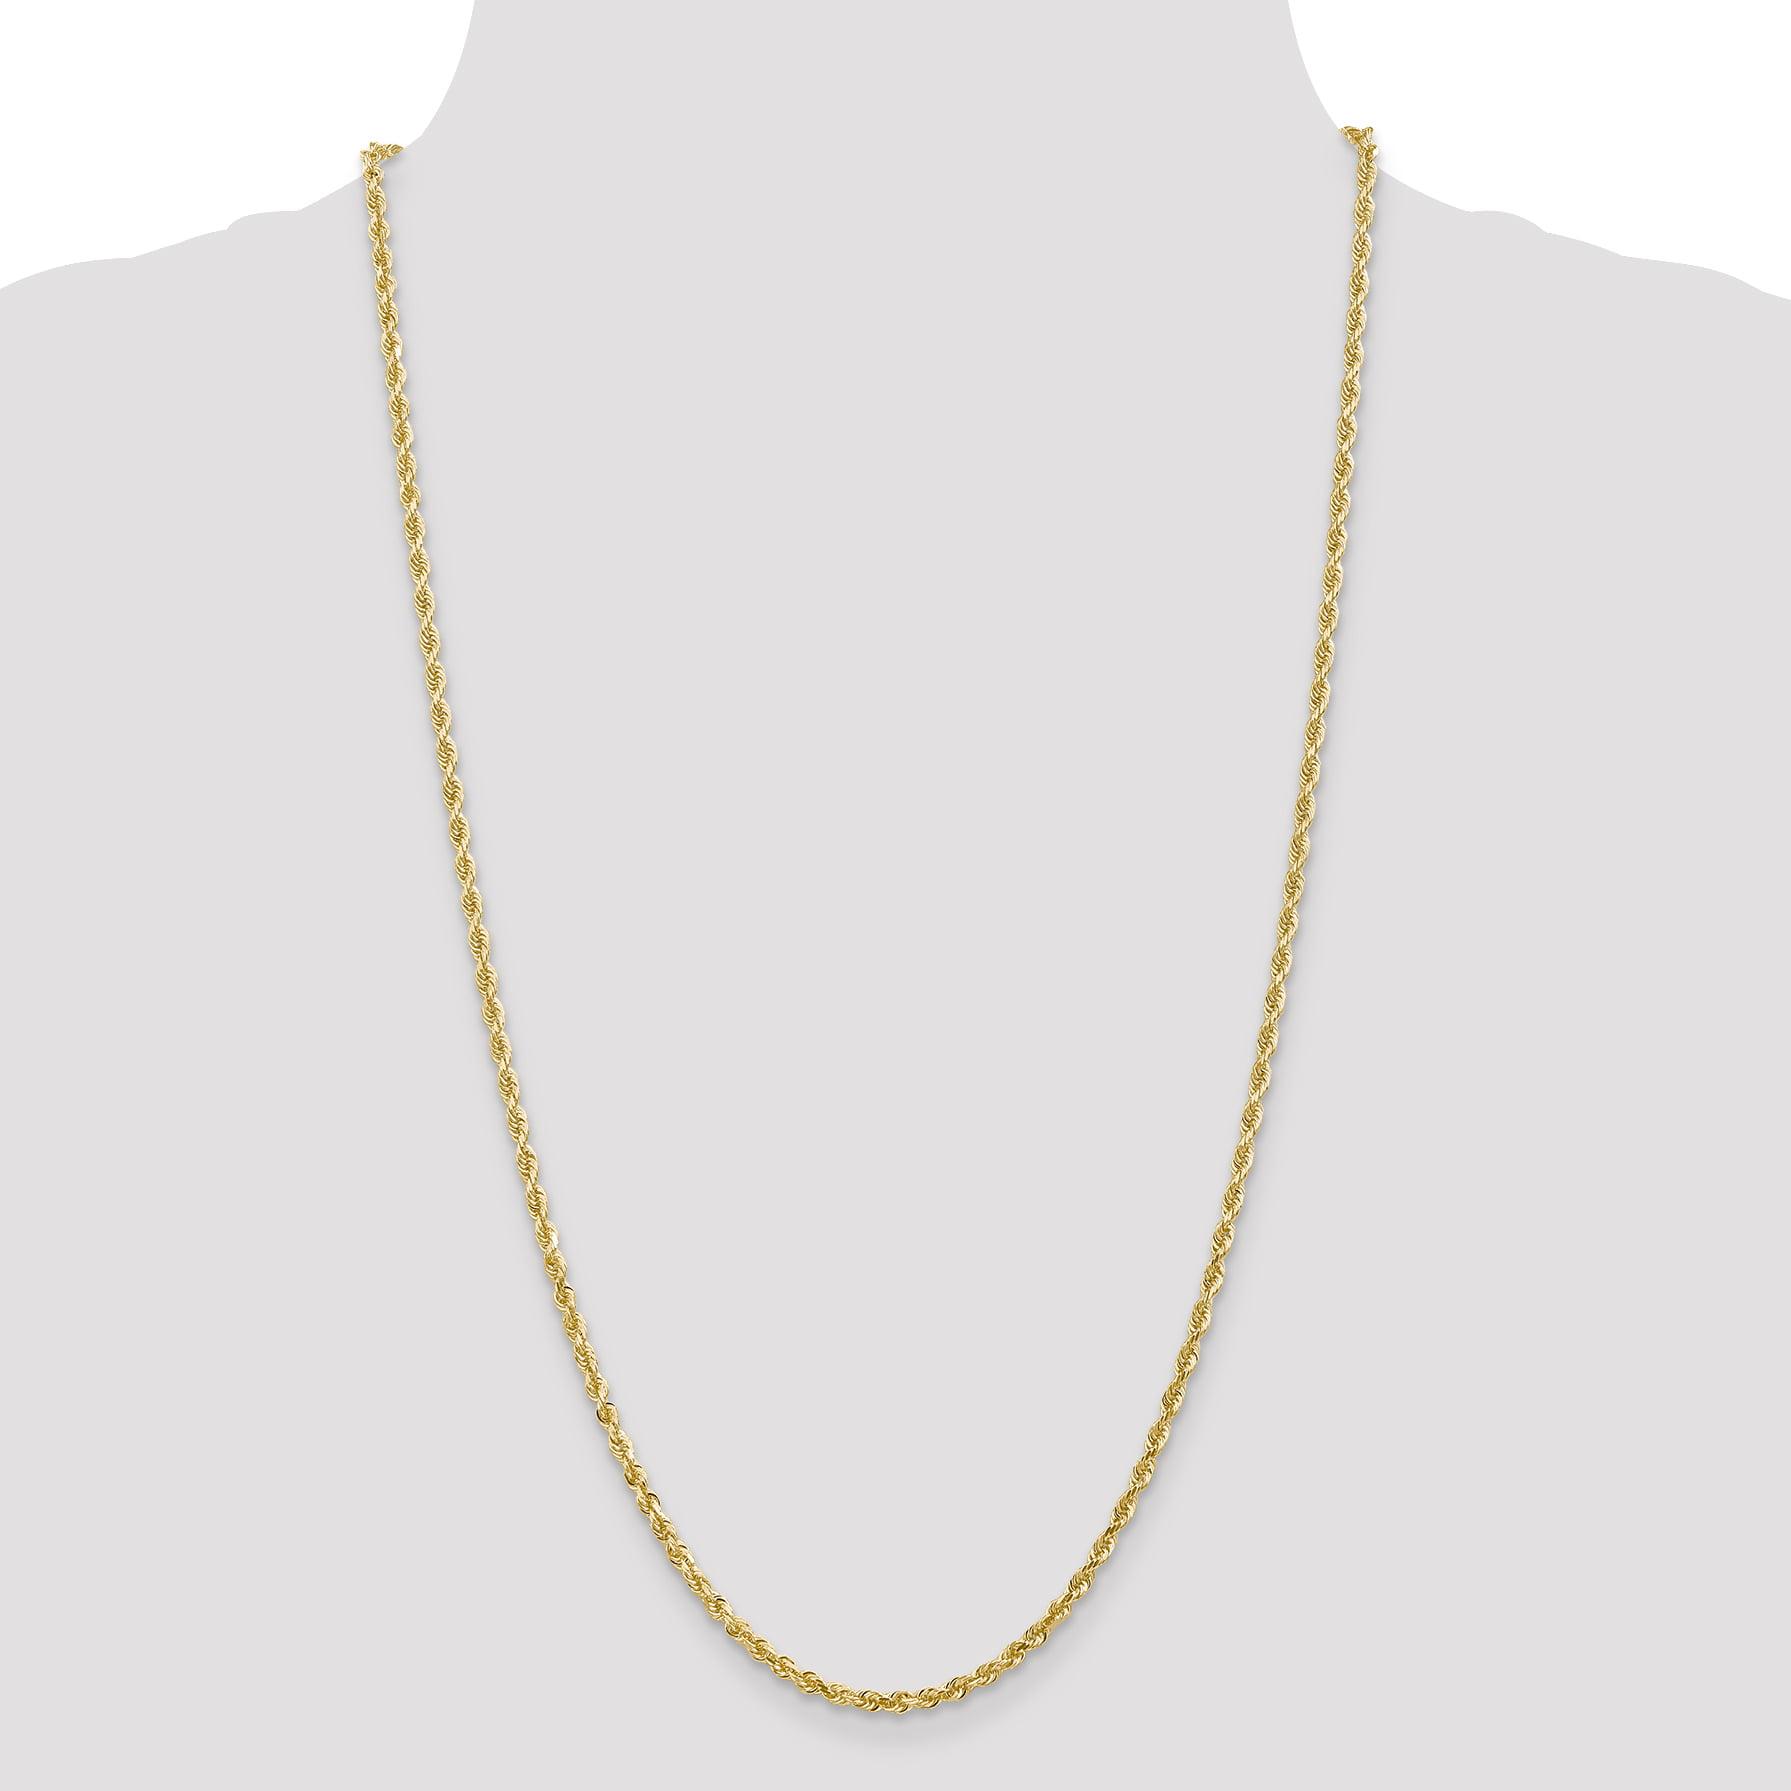 14K Yellow Gold 3.0mm Diamond Cut Quadruple Rope Chain 24 Inch - image 4 of 5